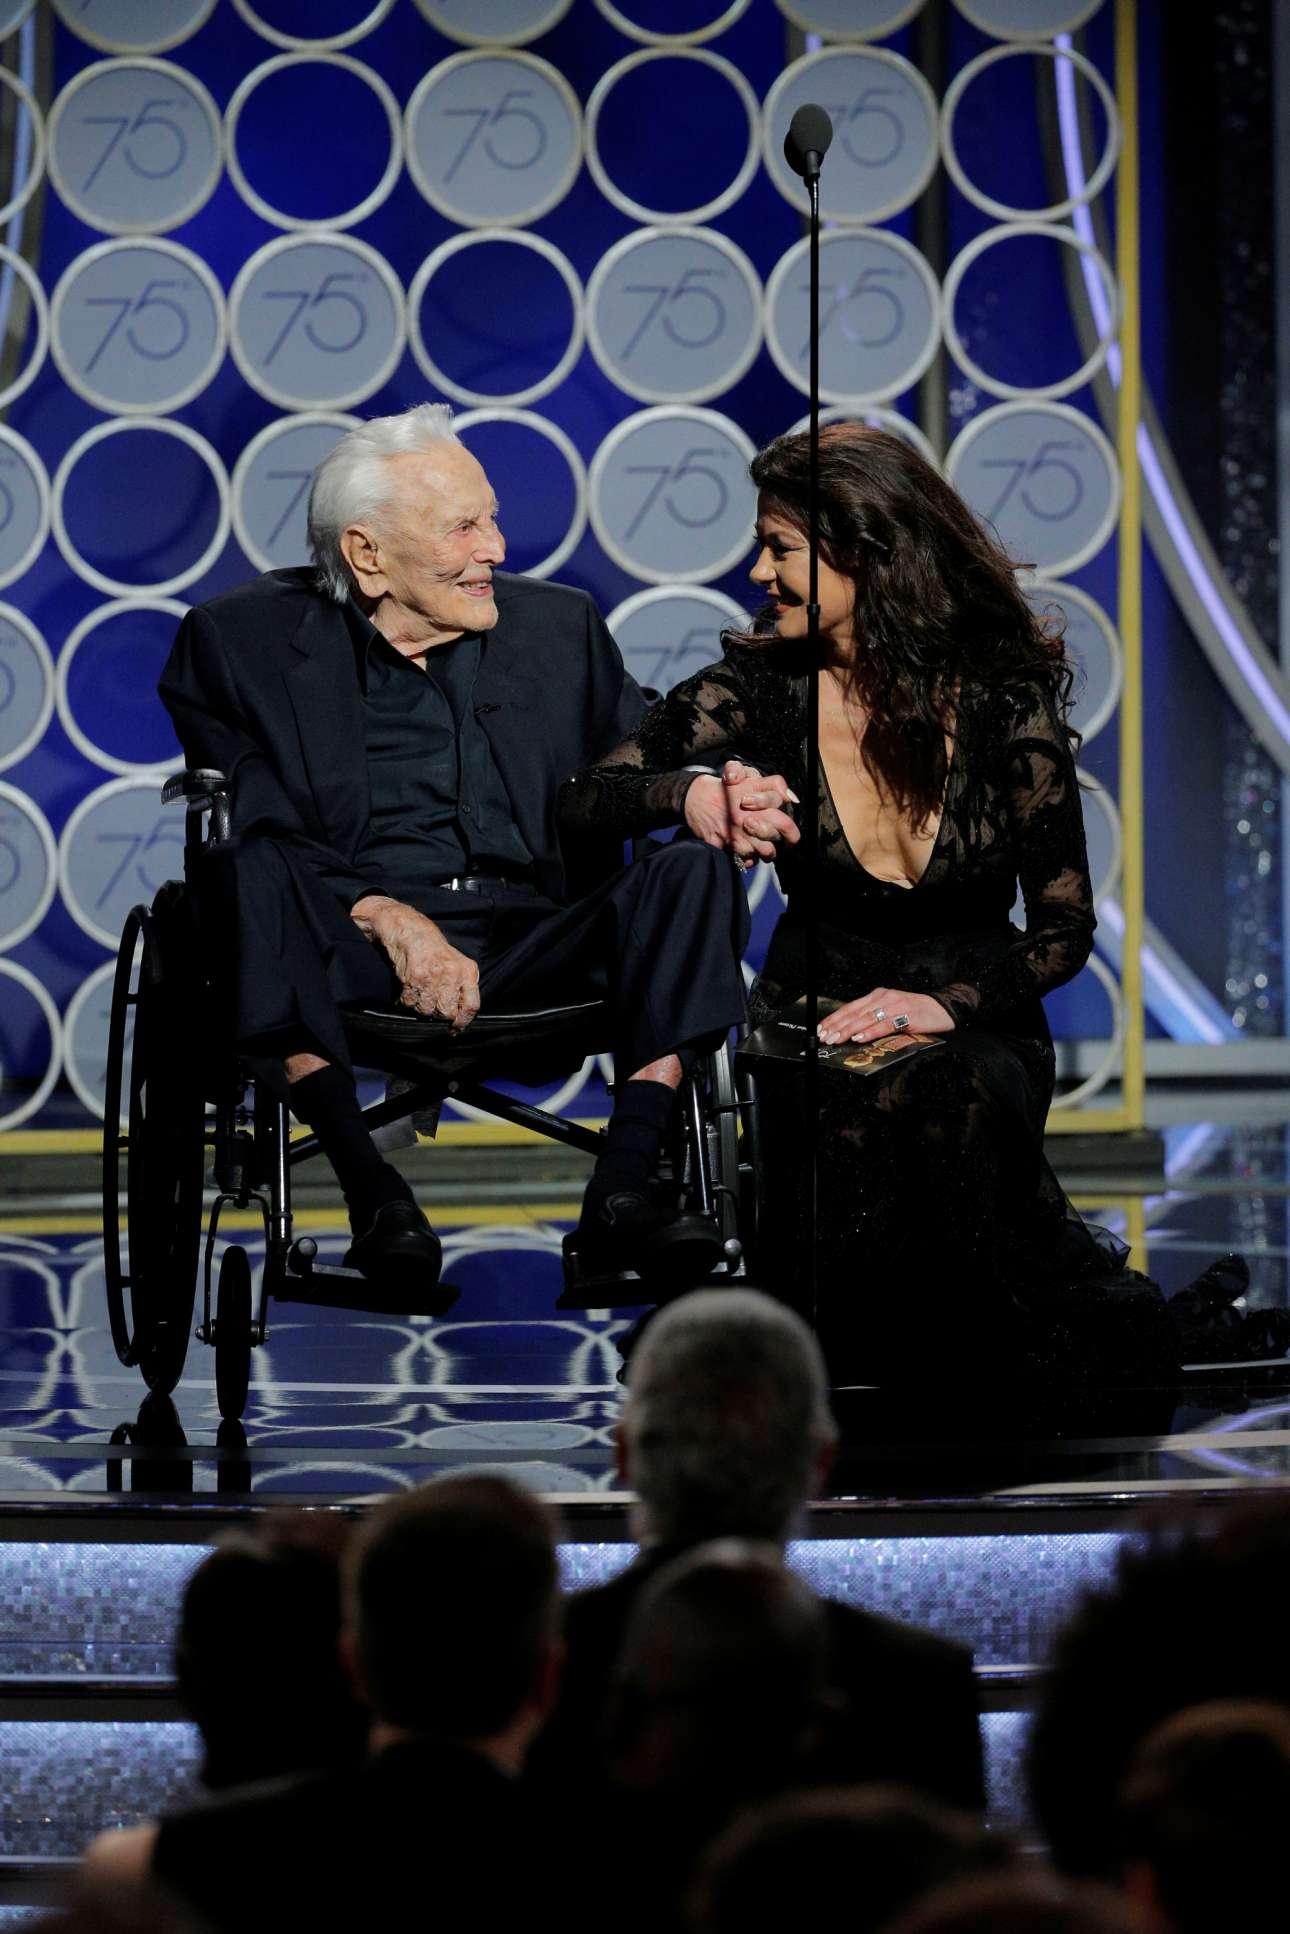 O θρύλος Κερκ Ντάγκλας, στα 101 του, κάνει την εμφάνισή του στο πλευρό της νύφης του, Κάθριν Ζέτα Τζόουνς